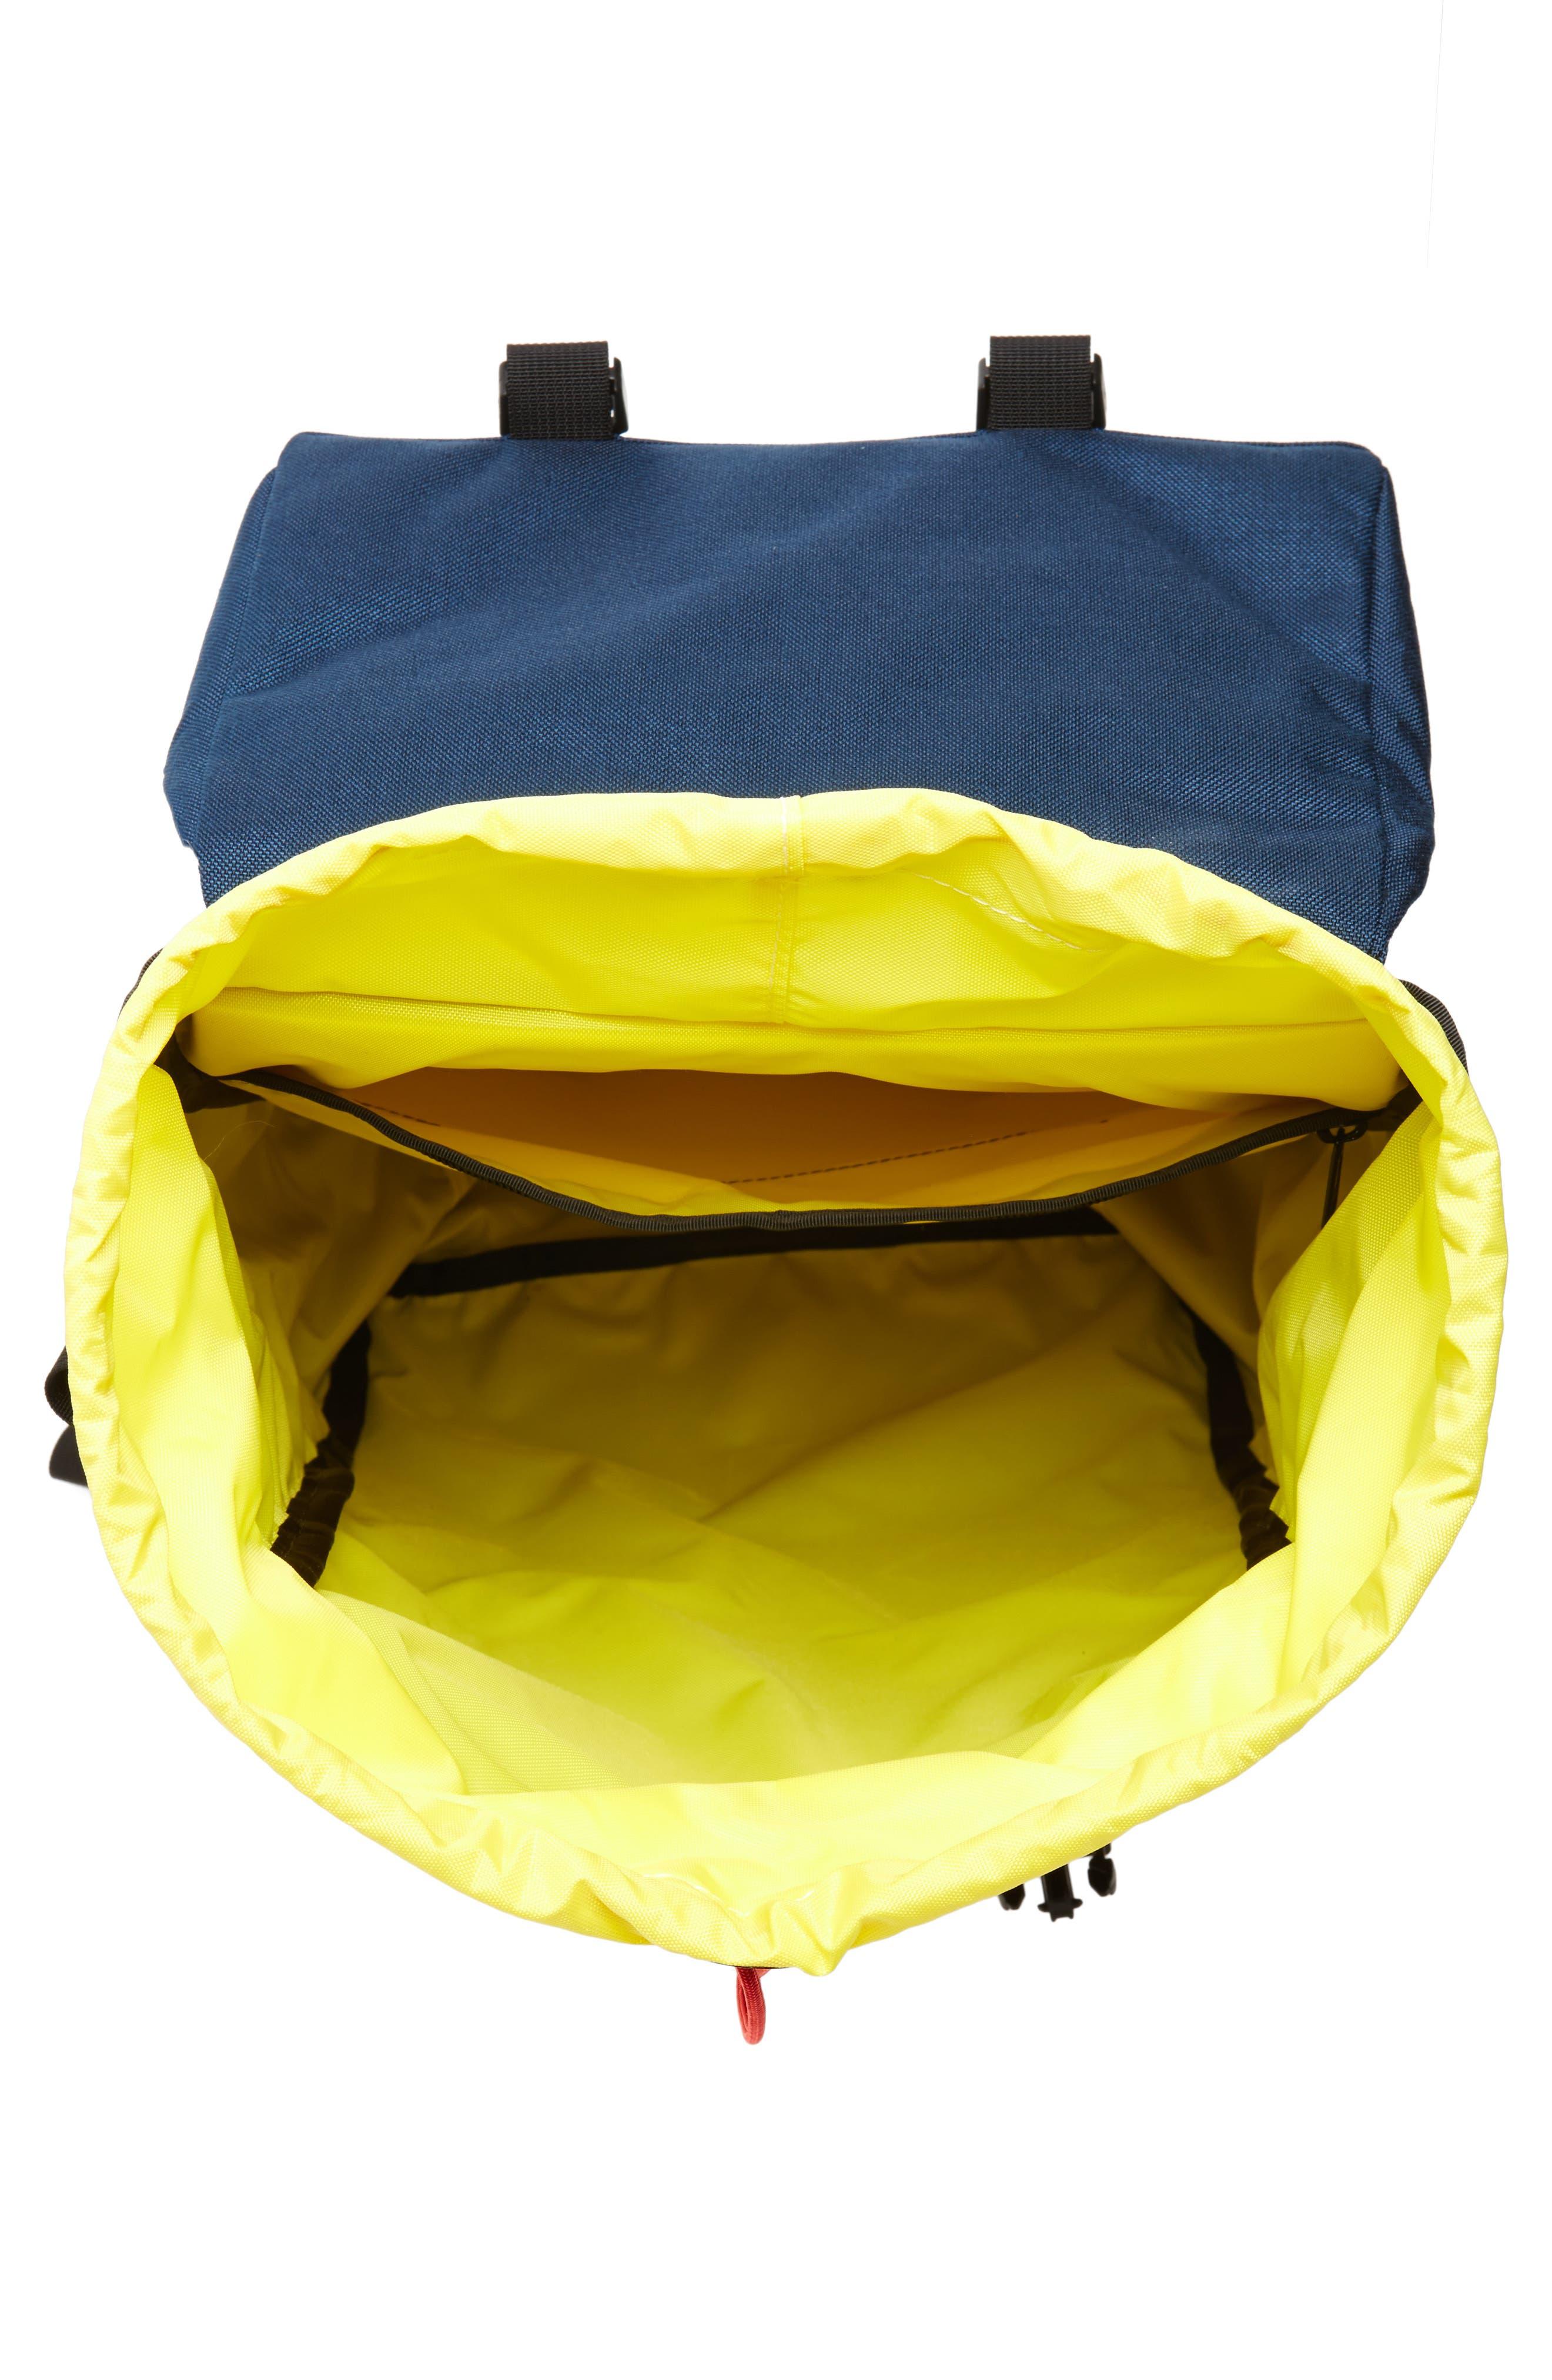 'Klettersack' Backpack,                             Alternate thumbnail 4, color,                             Navy